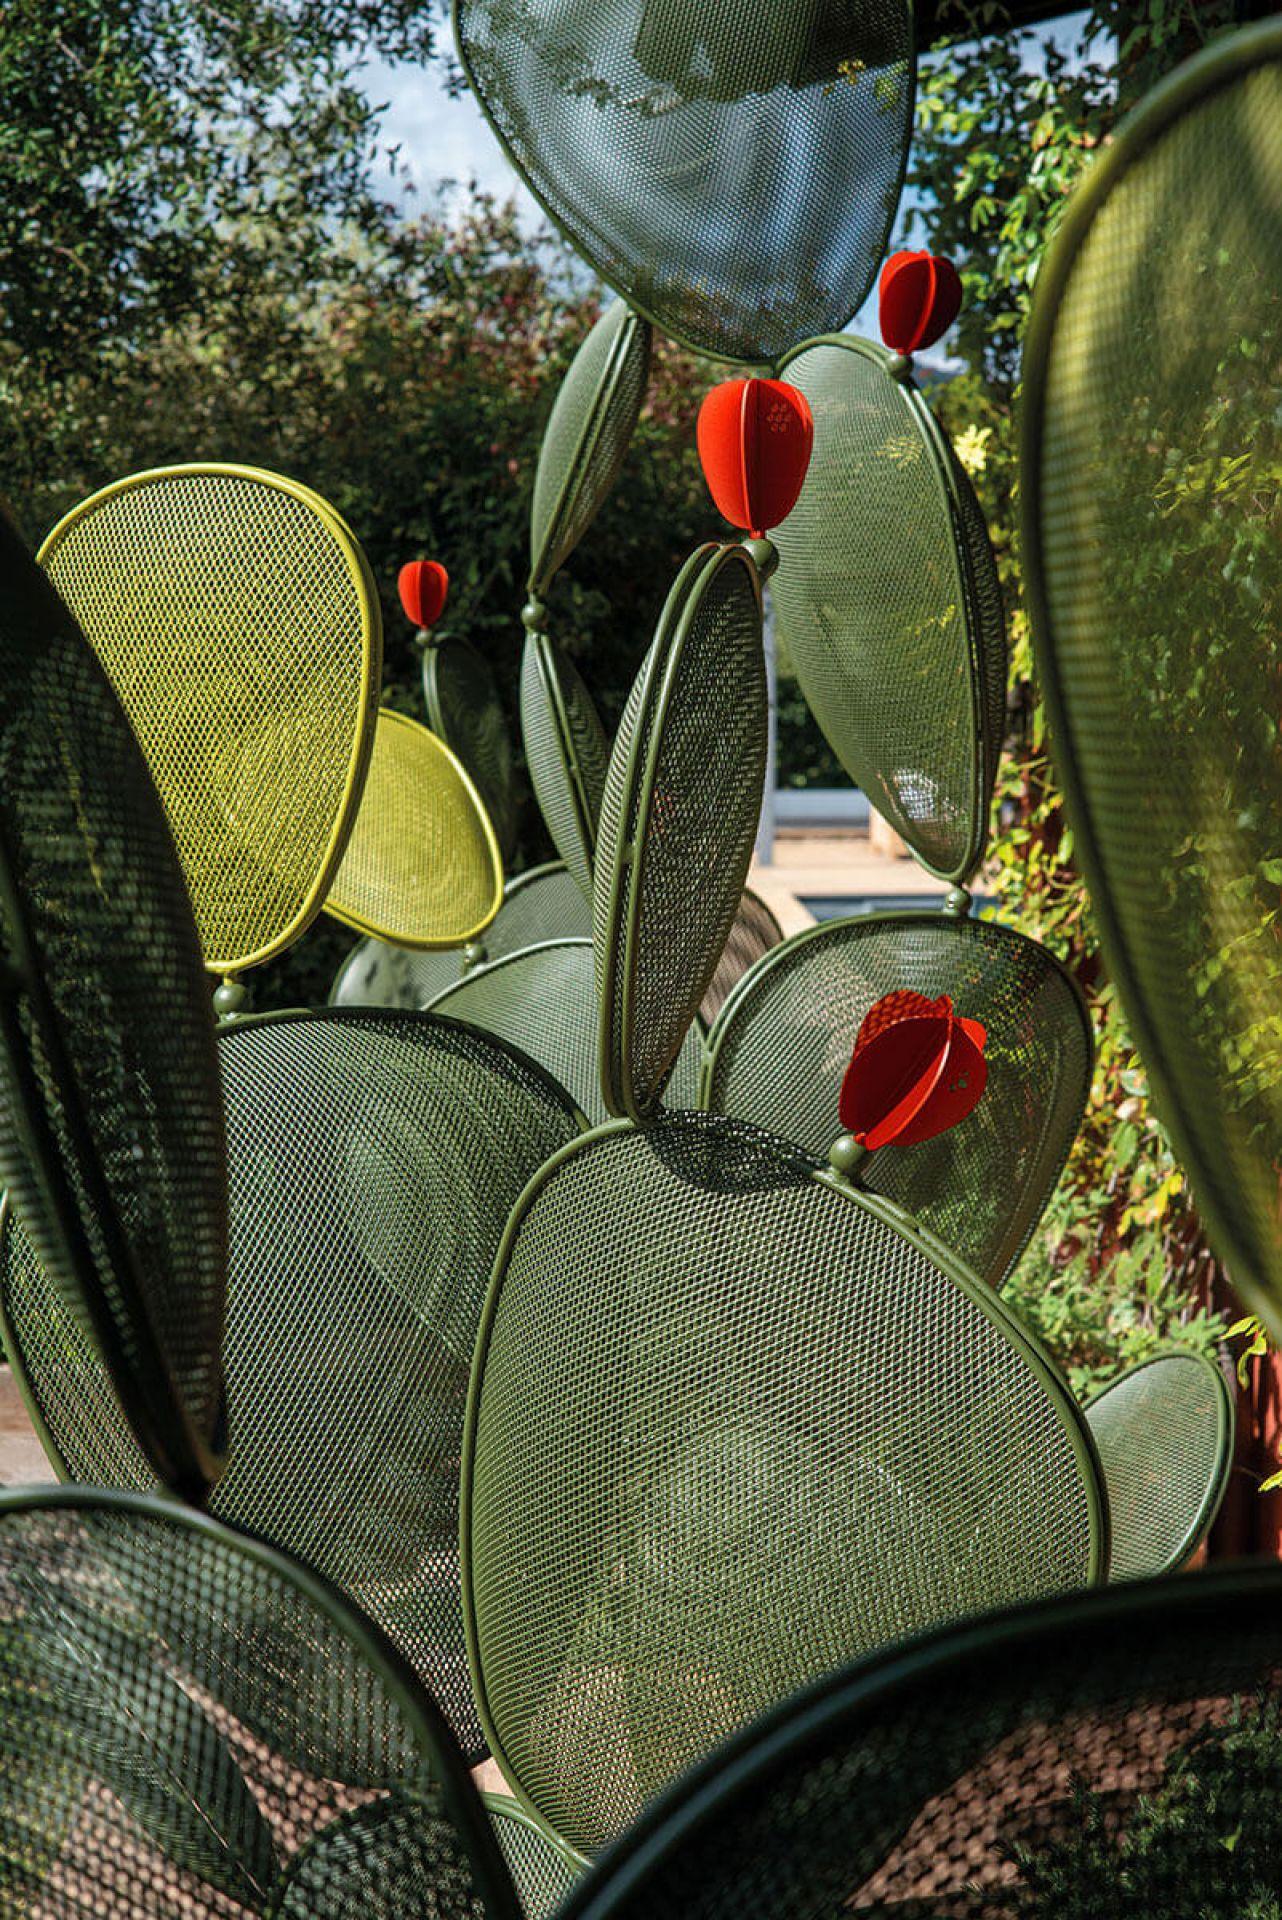 FicusAccessoires de jardin / lampadaire d'extérieur module de base Emu